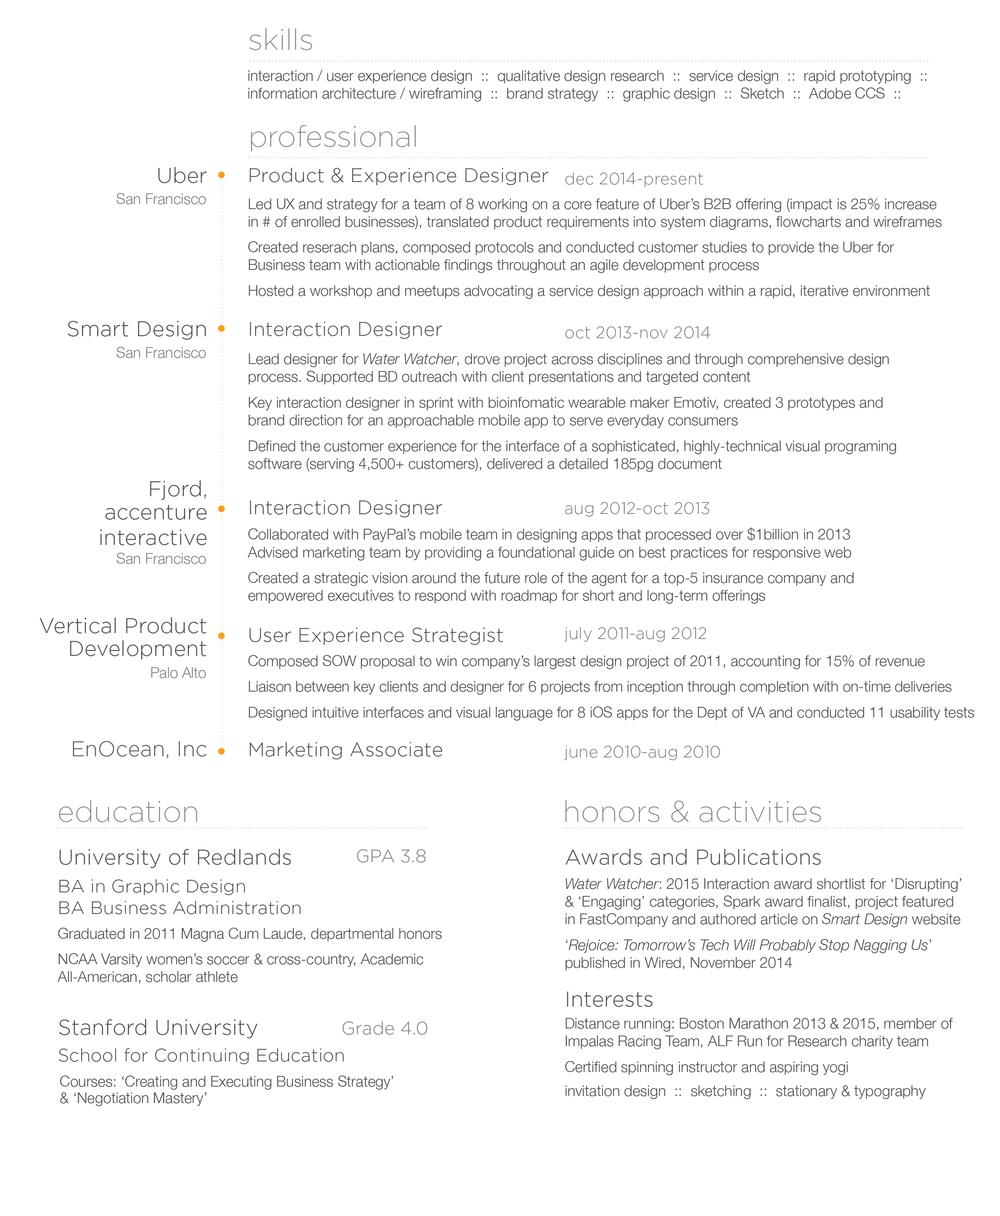 KelseyOCallaghan_Resume